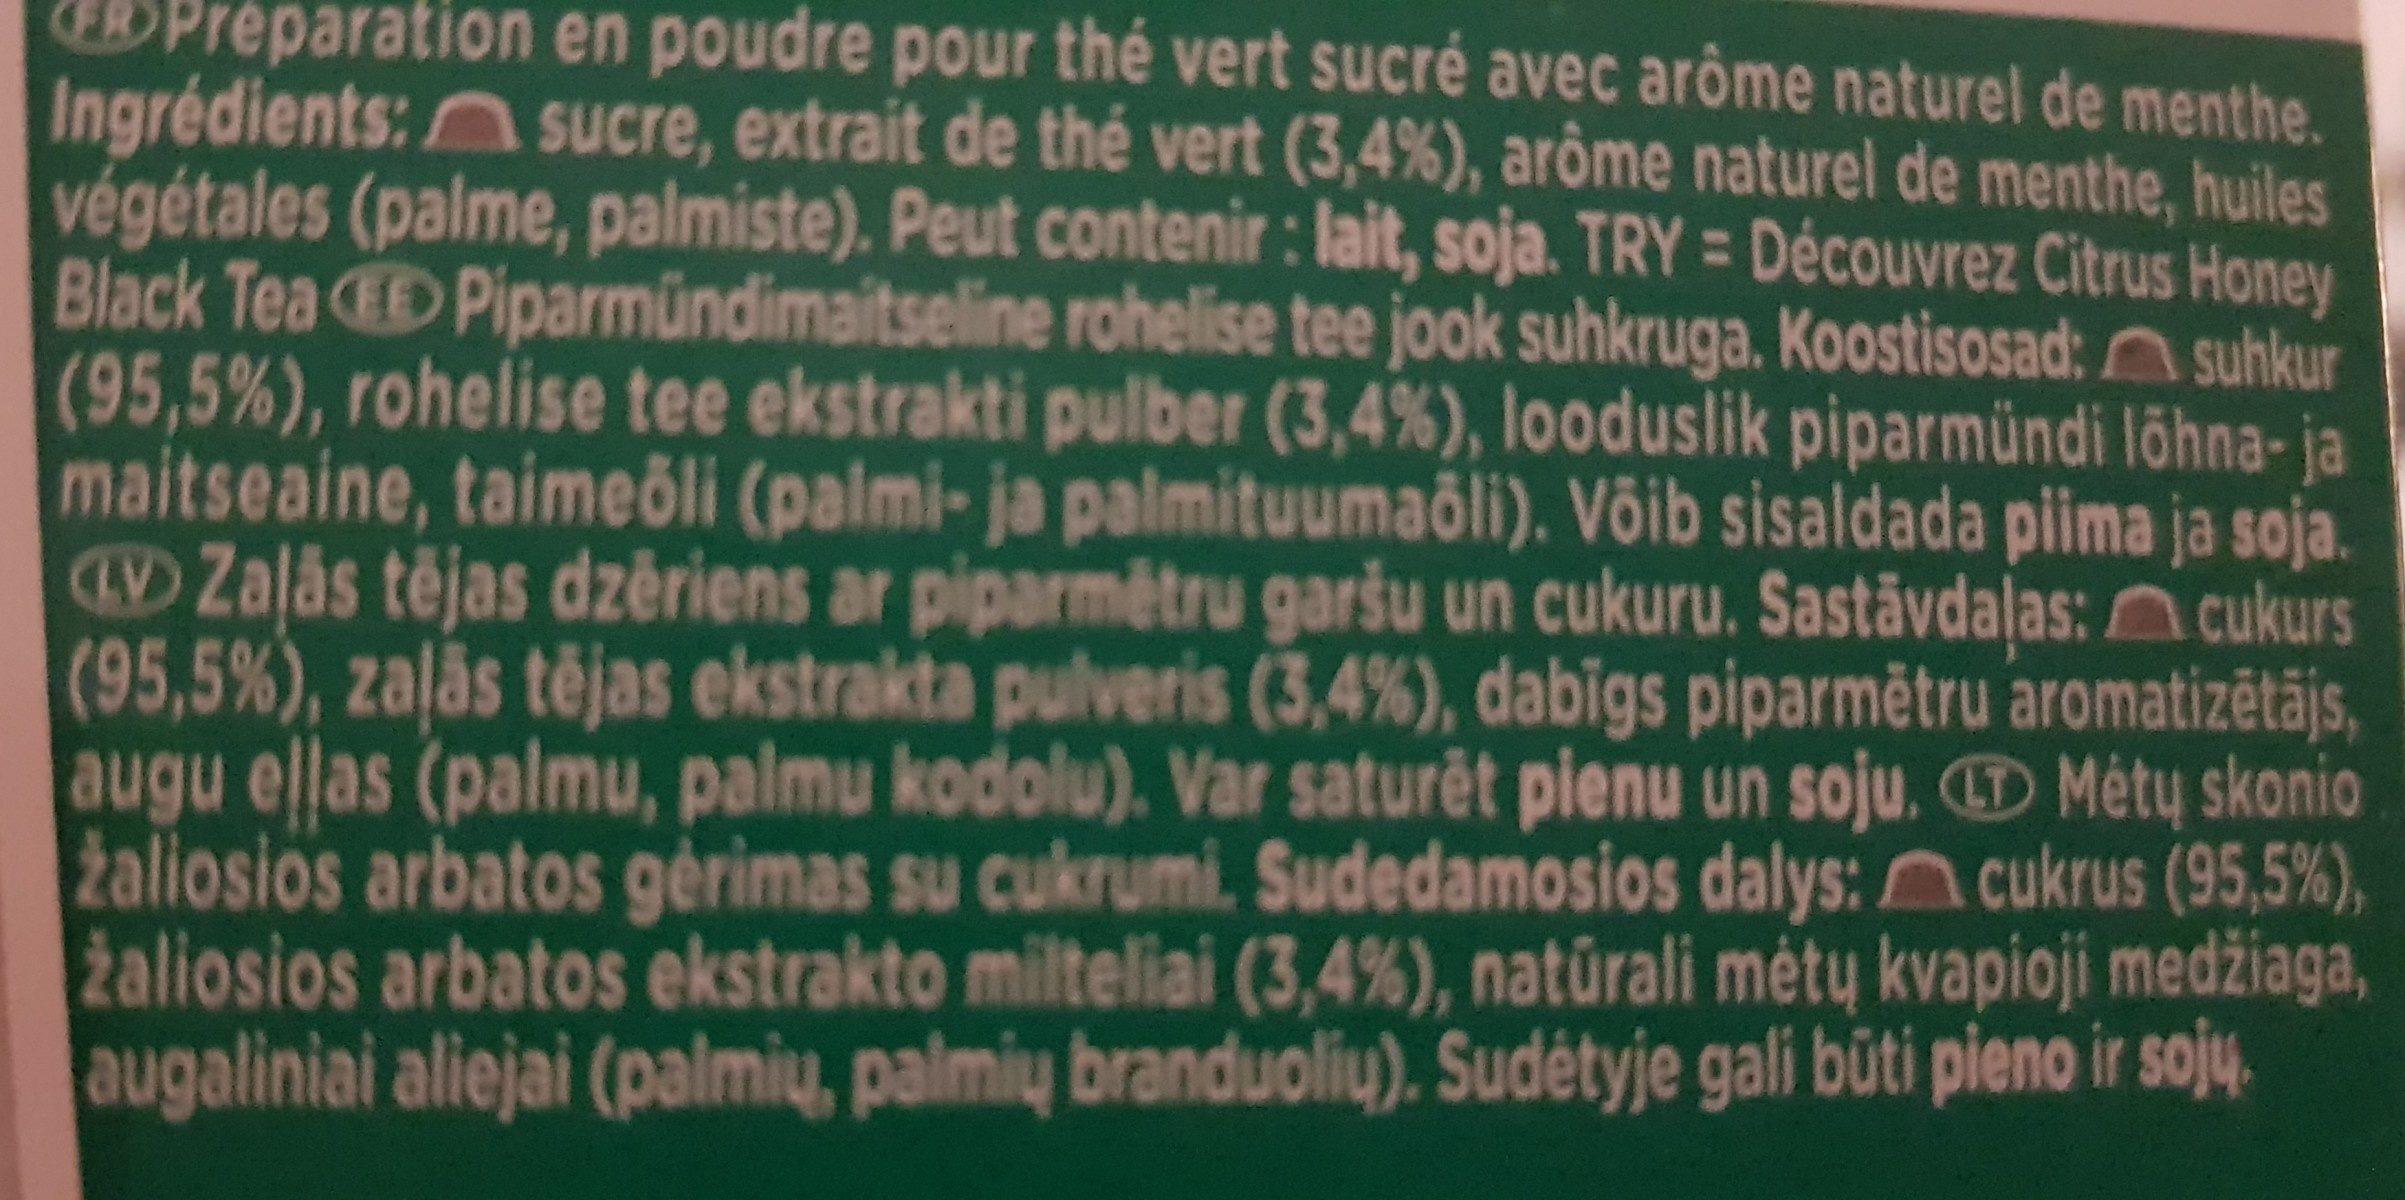 Dolce Gusto Marrakech Tea - Ingredients